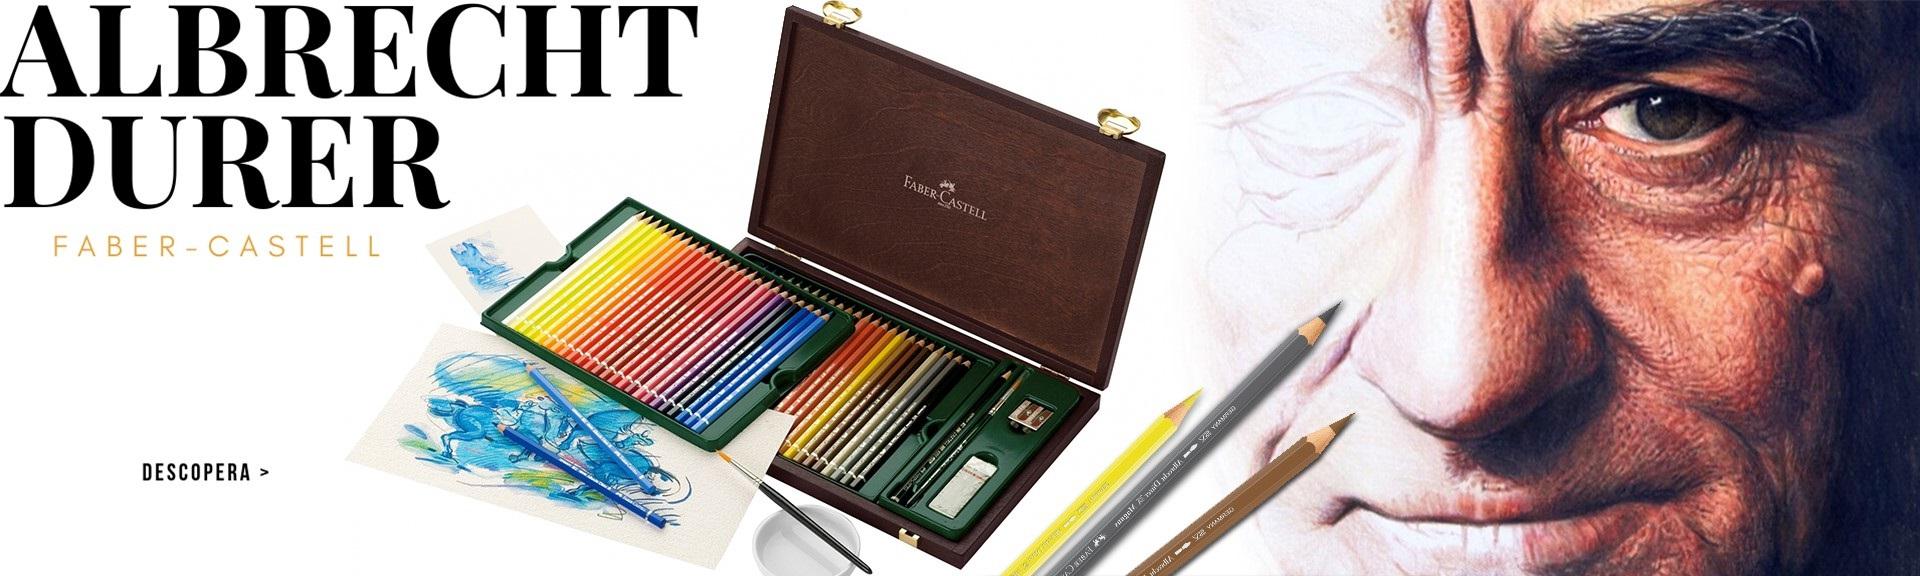 Albrecht Durer - creioane colorate acuarela